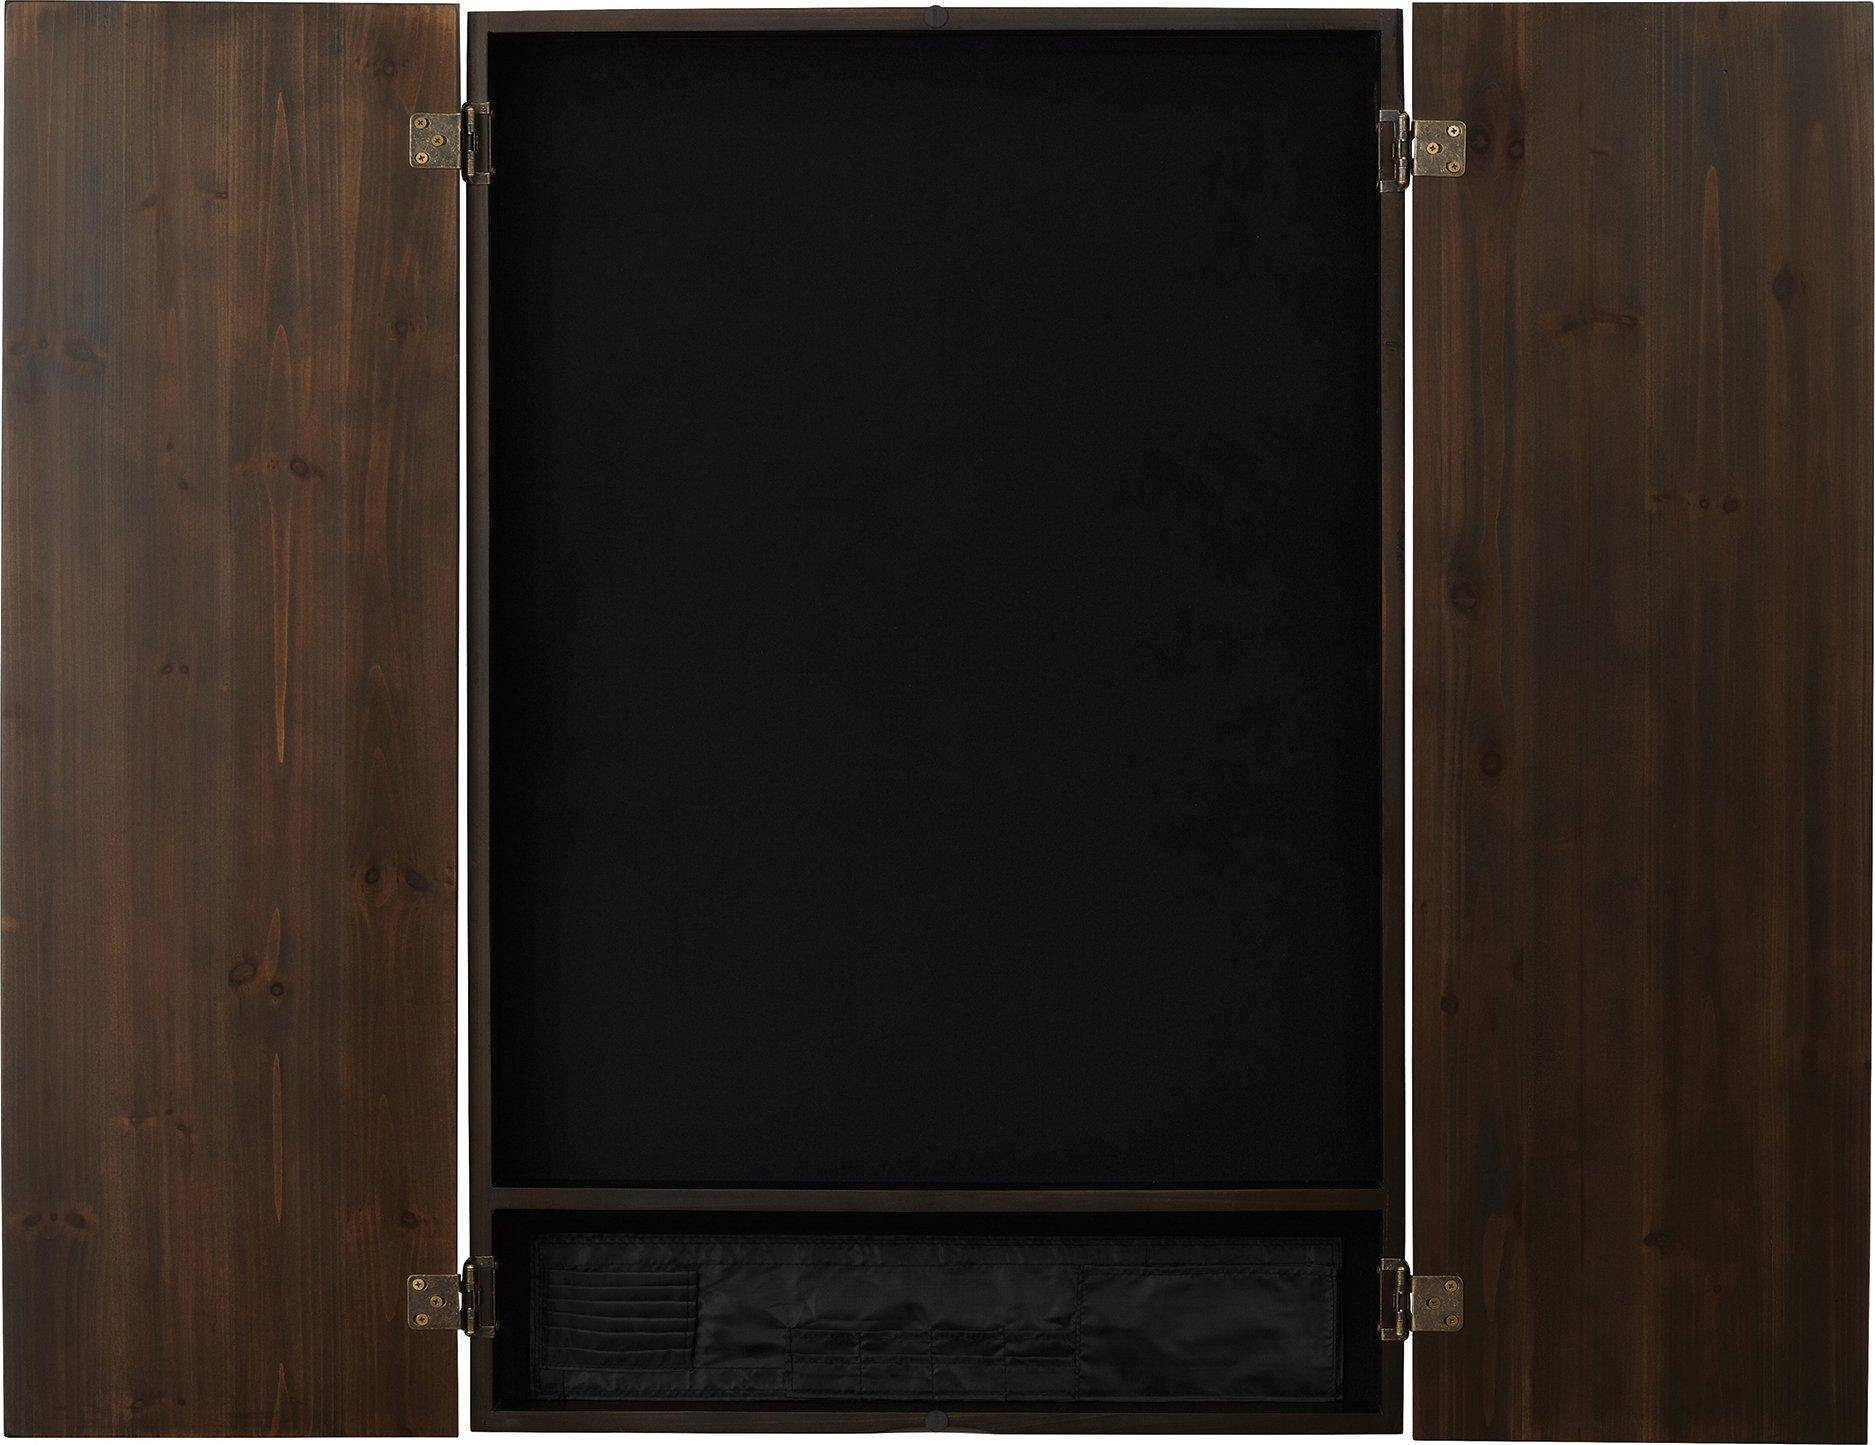 Viper Metropolitan Electronic Soft Tip Dartboard Cabinet: Cabinet Only (No Dartboard), Espresso Finish